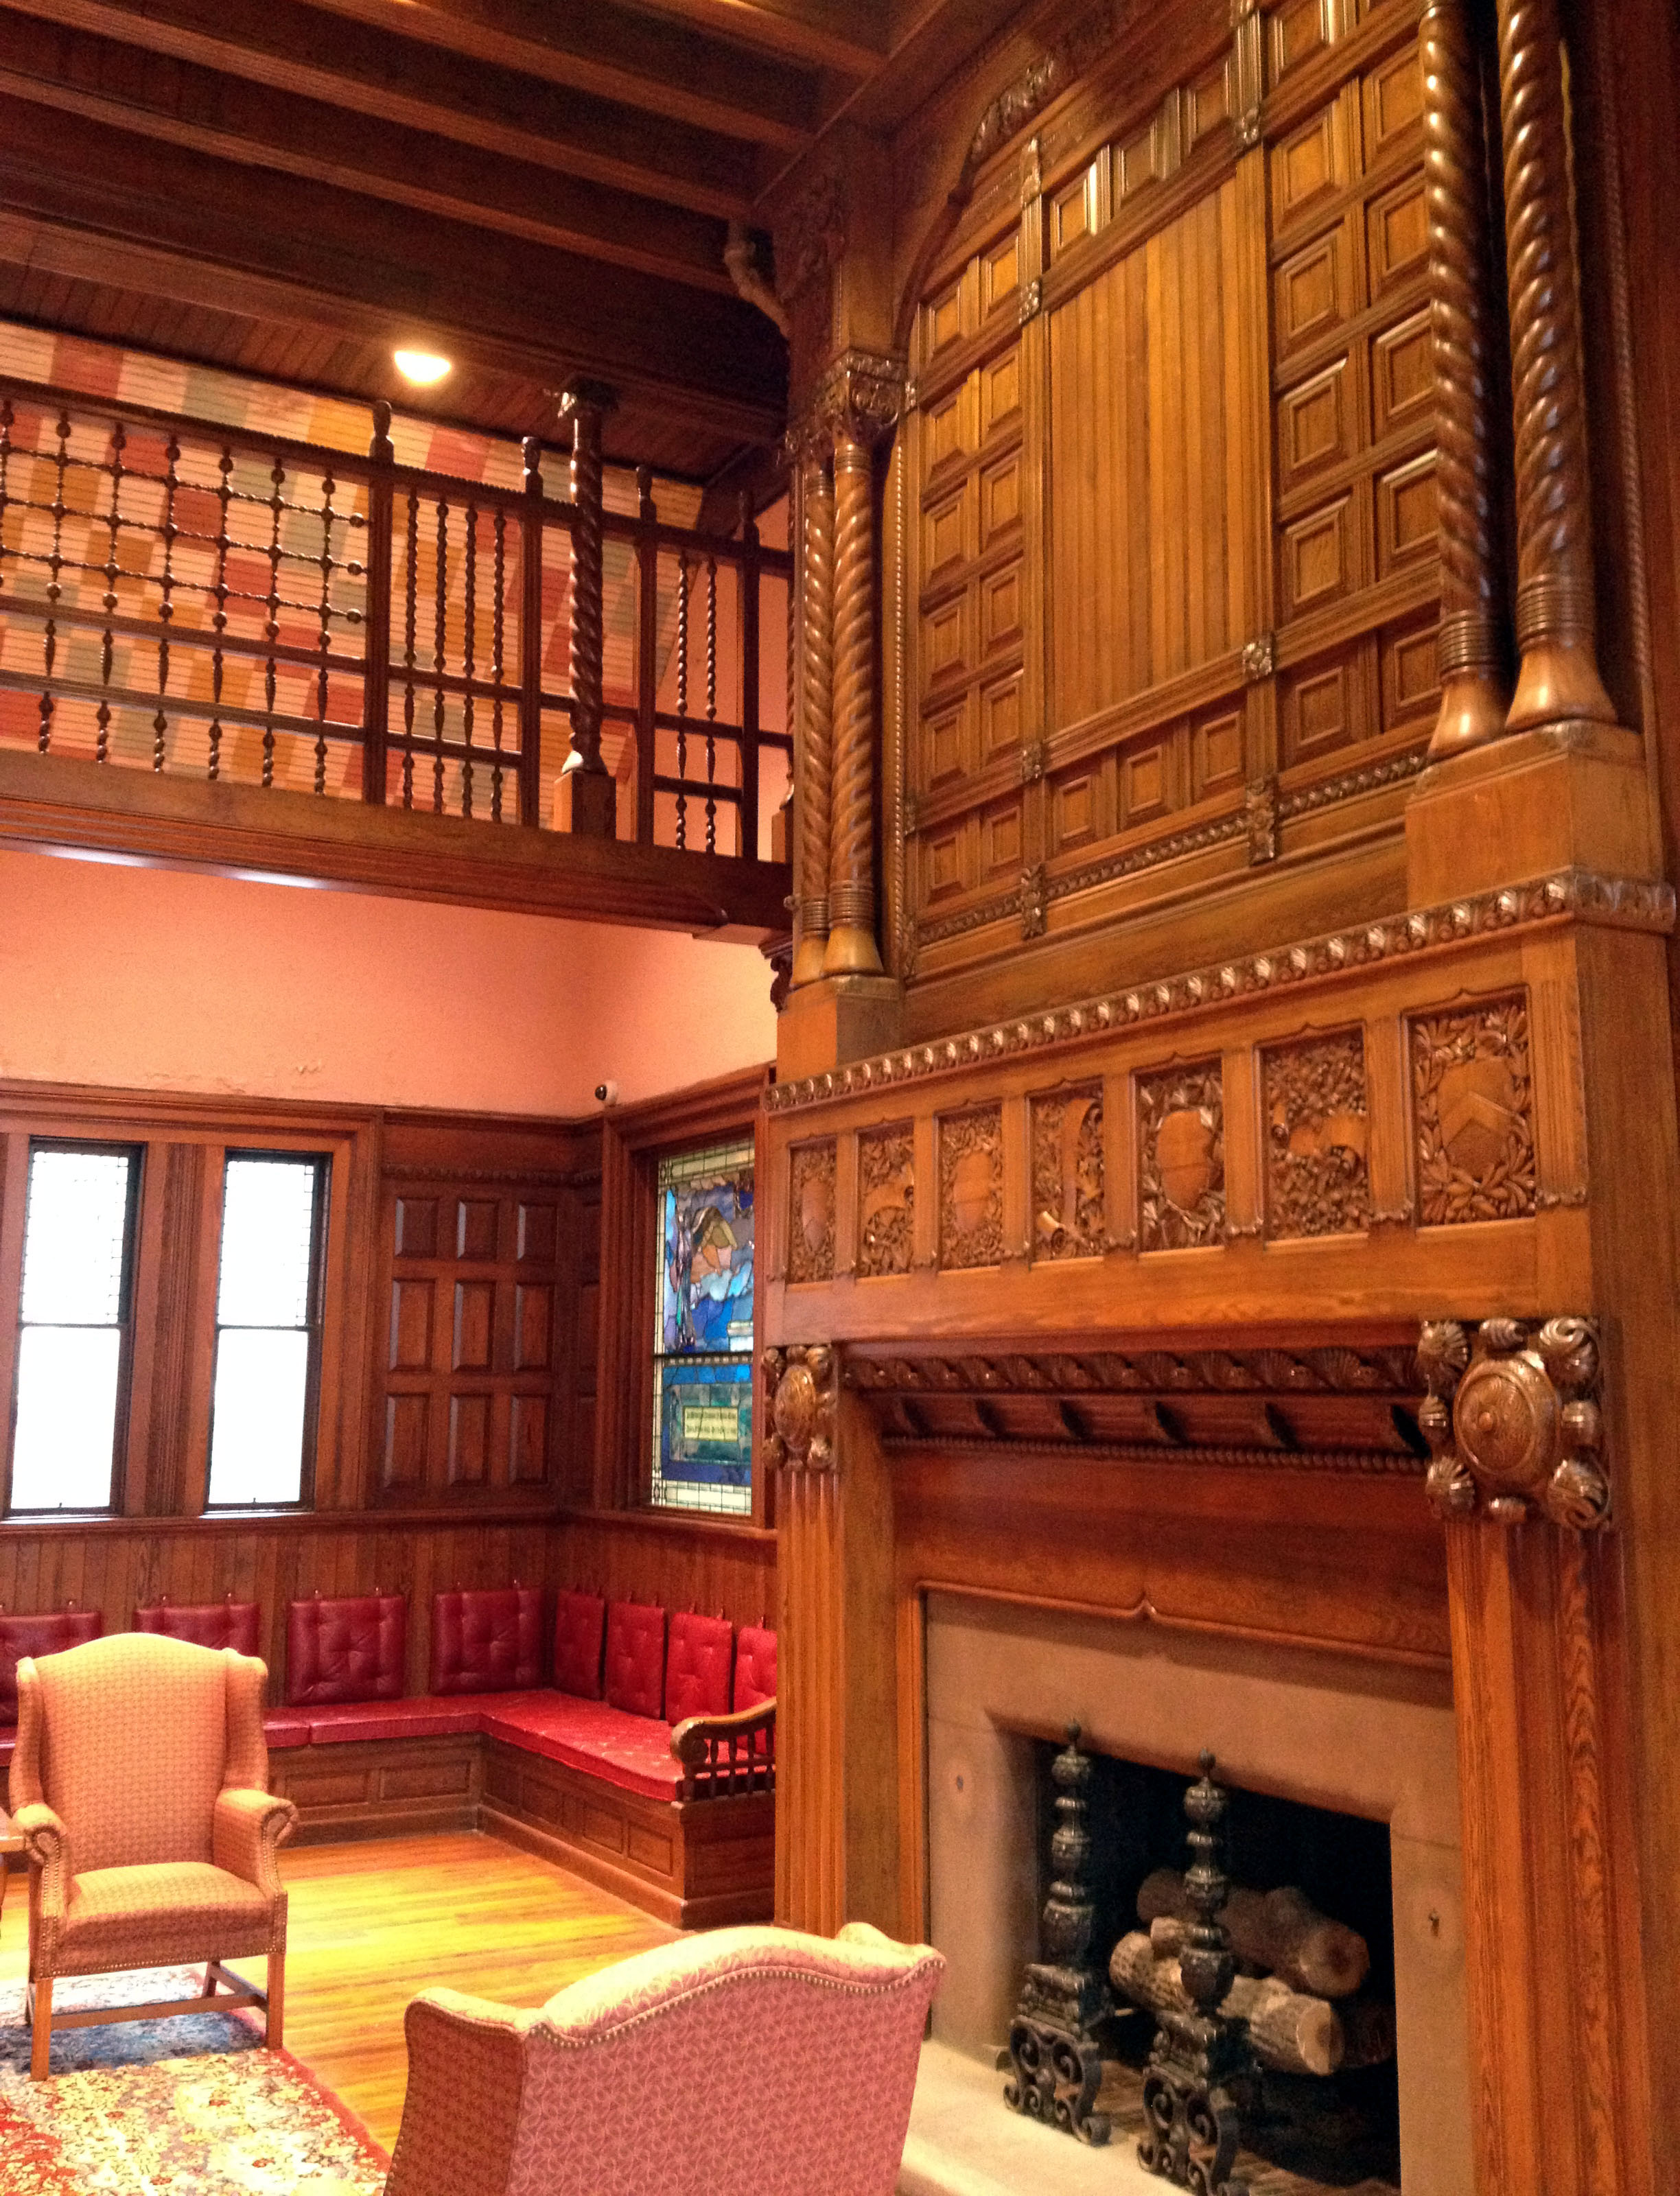 FileThomas Crane Library Fireplace In Richardson Room